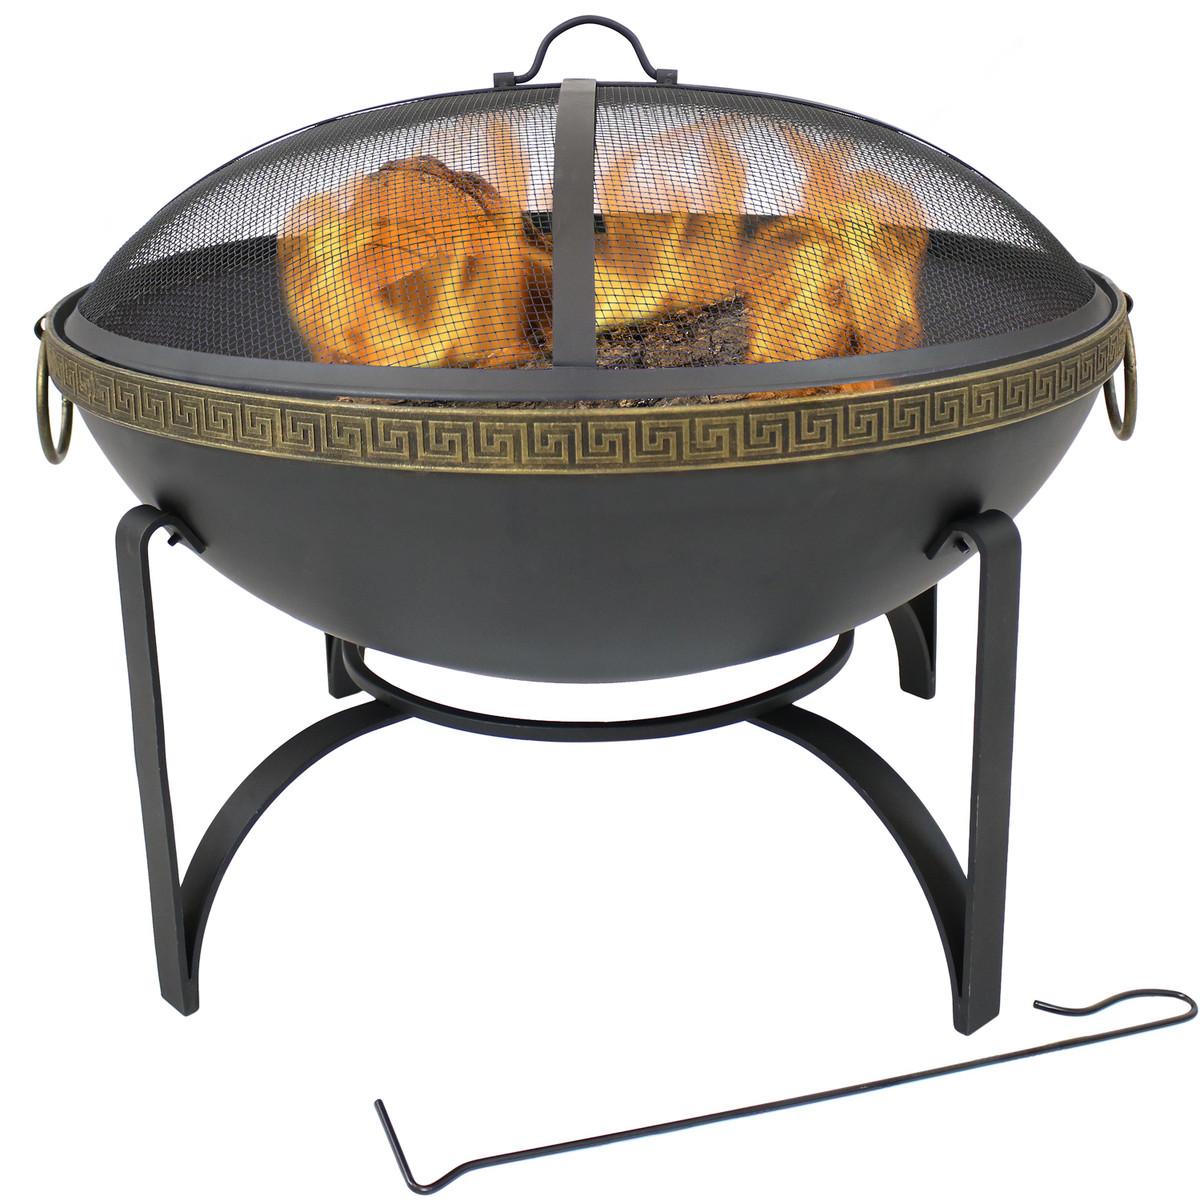 Admirable Sunnydaze Contemporary Steel Outdoor Wood Burning Fire Bowl Uwap Interior Chair Design Uwaporg